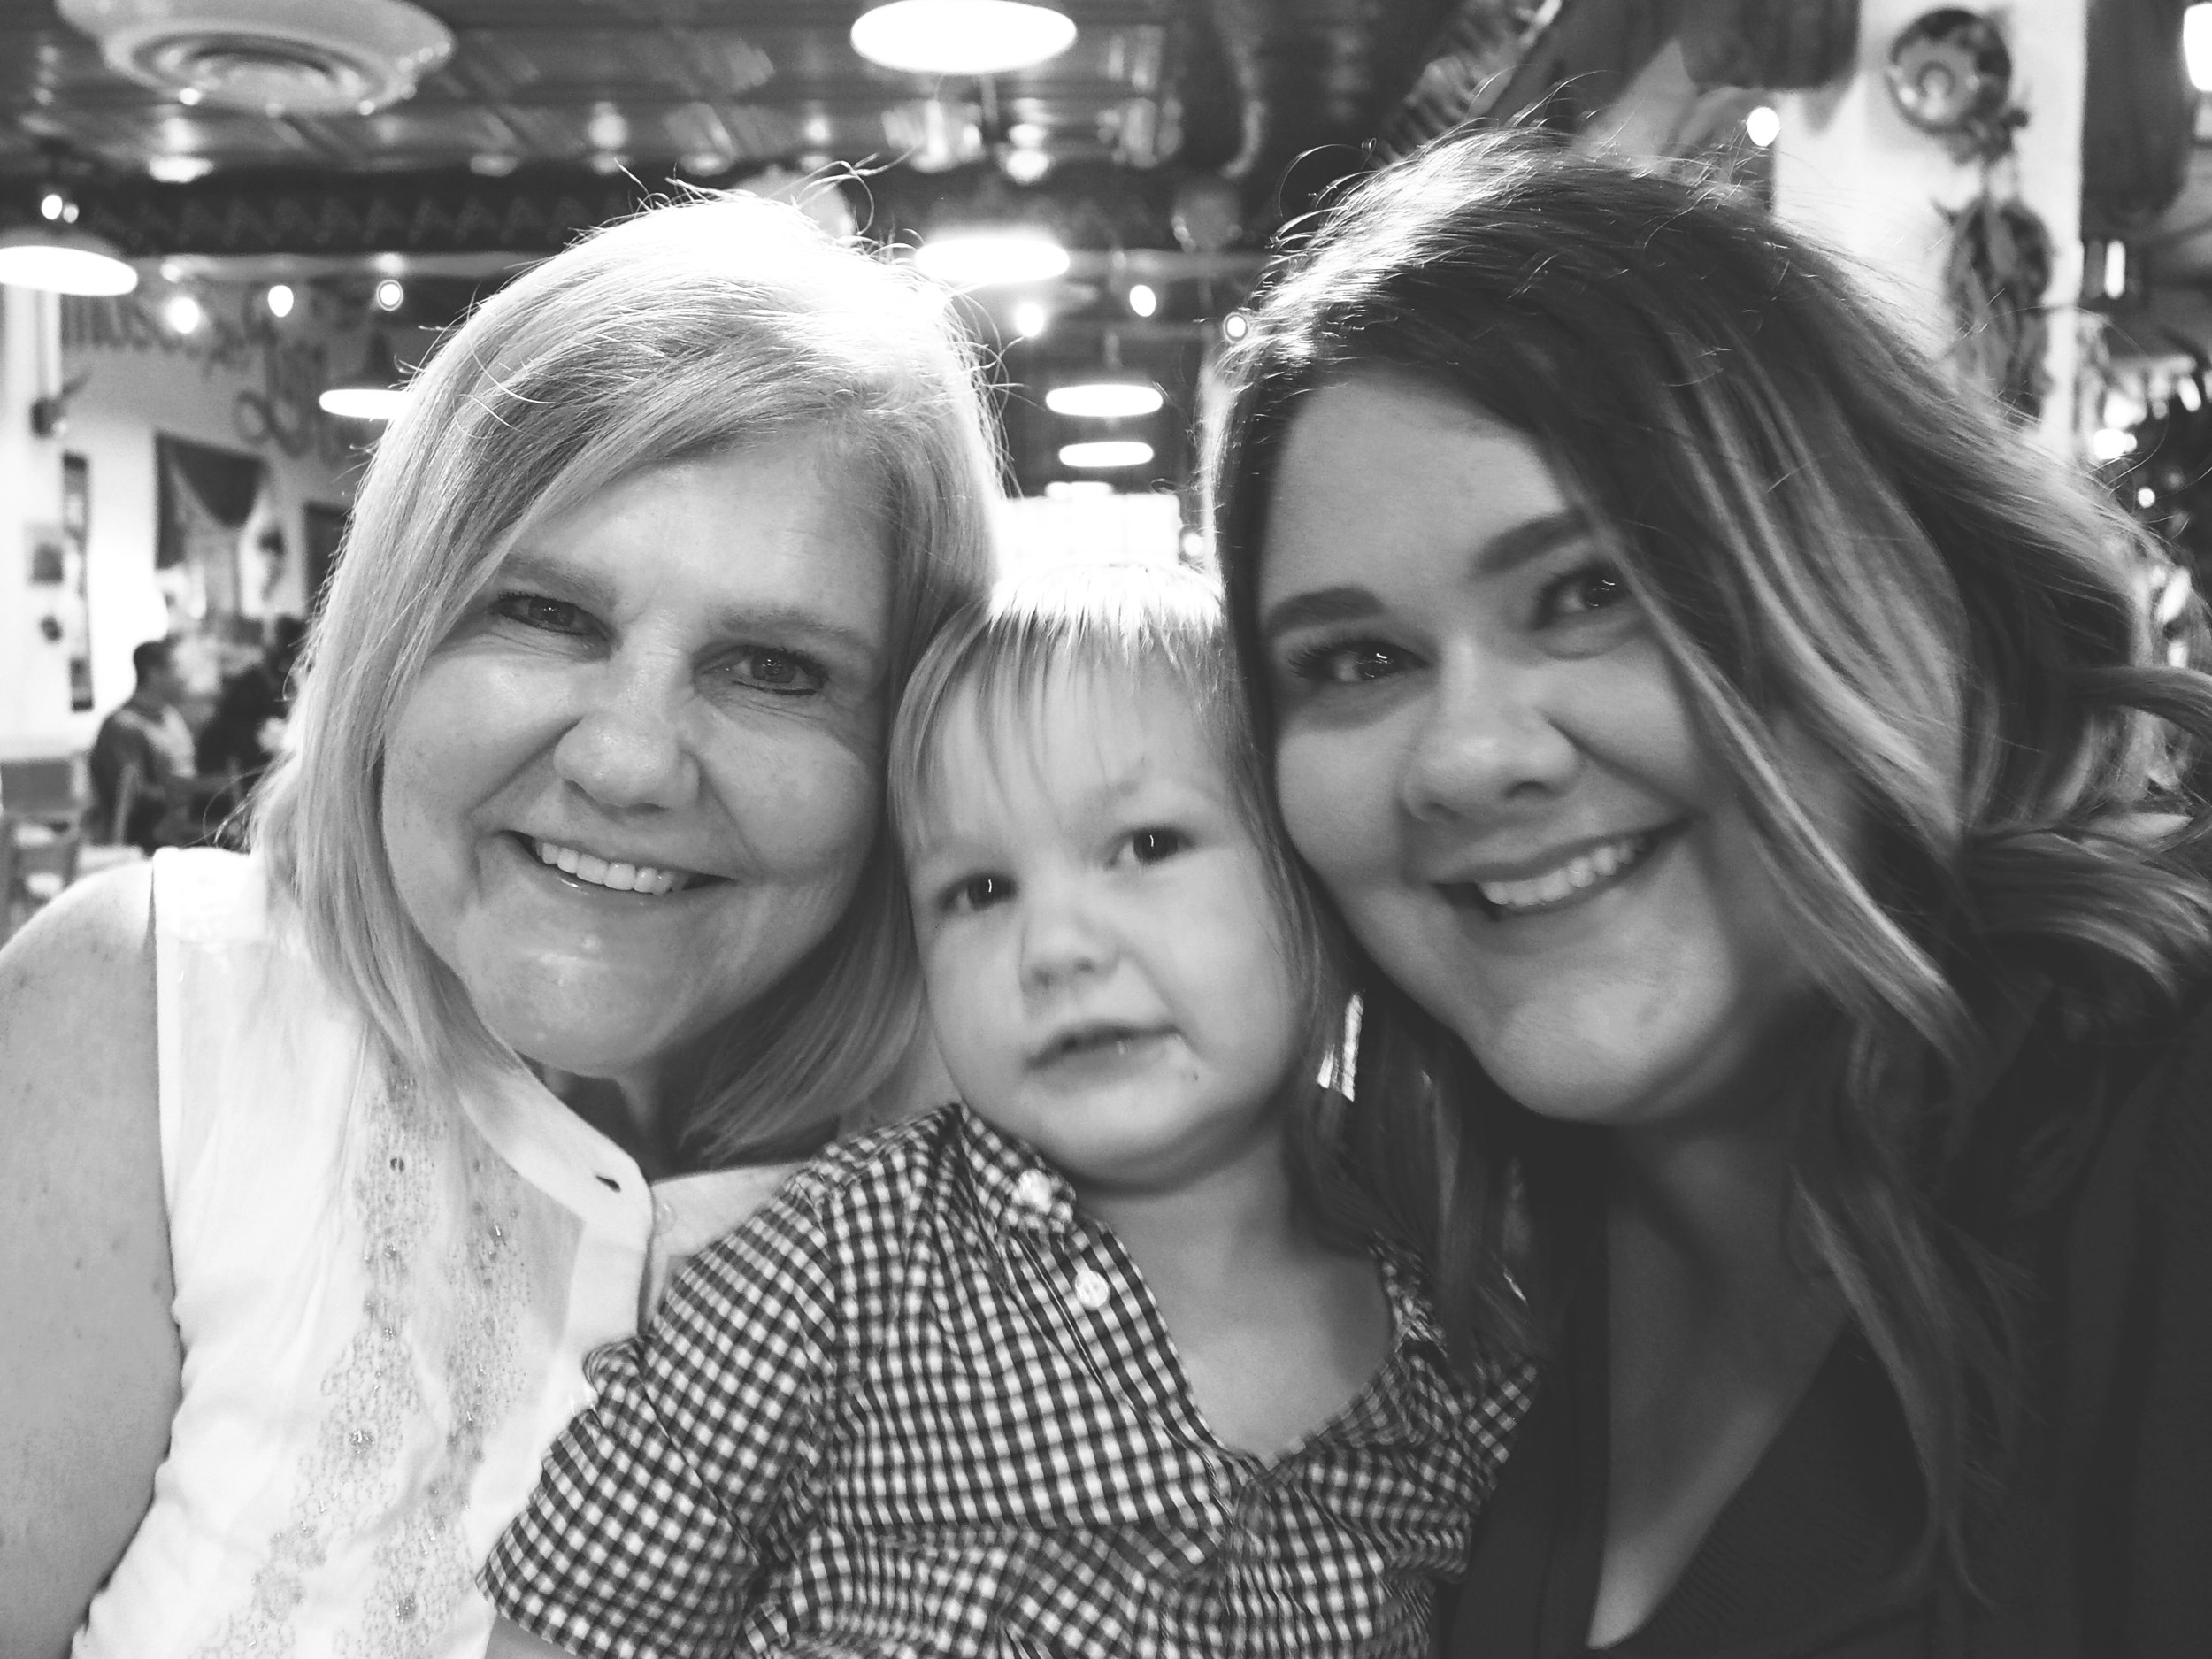 Lyndsey's mom, Mercer, and Lyndsey's twin sister